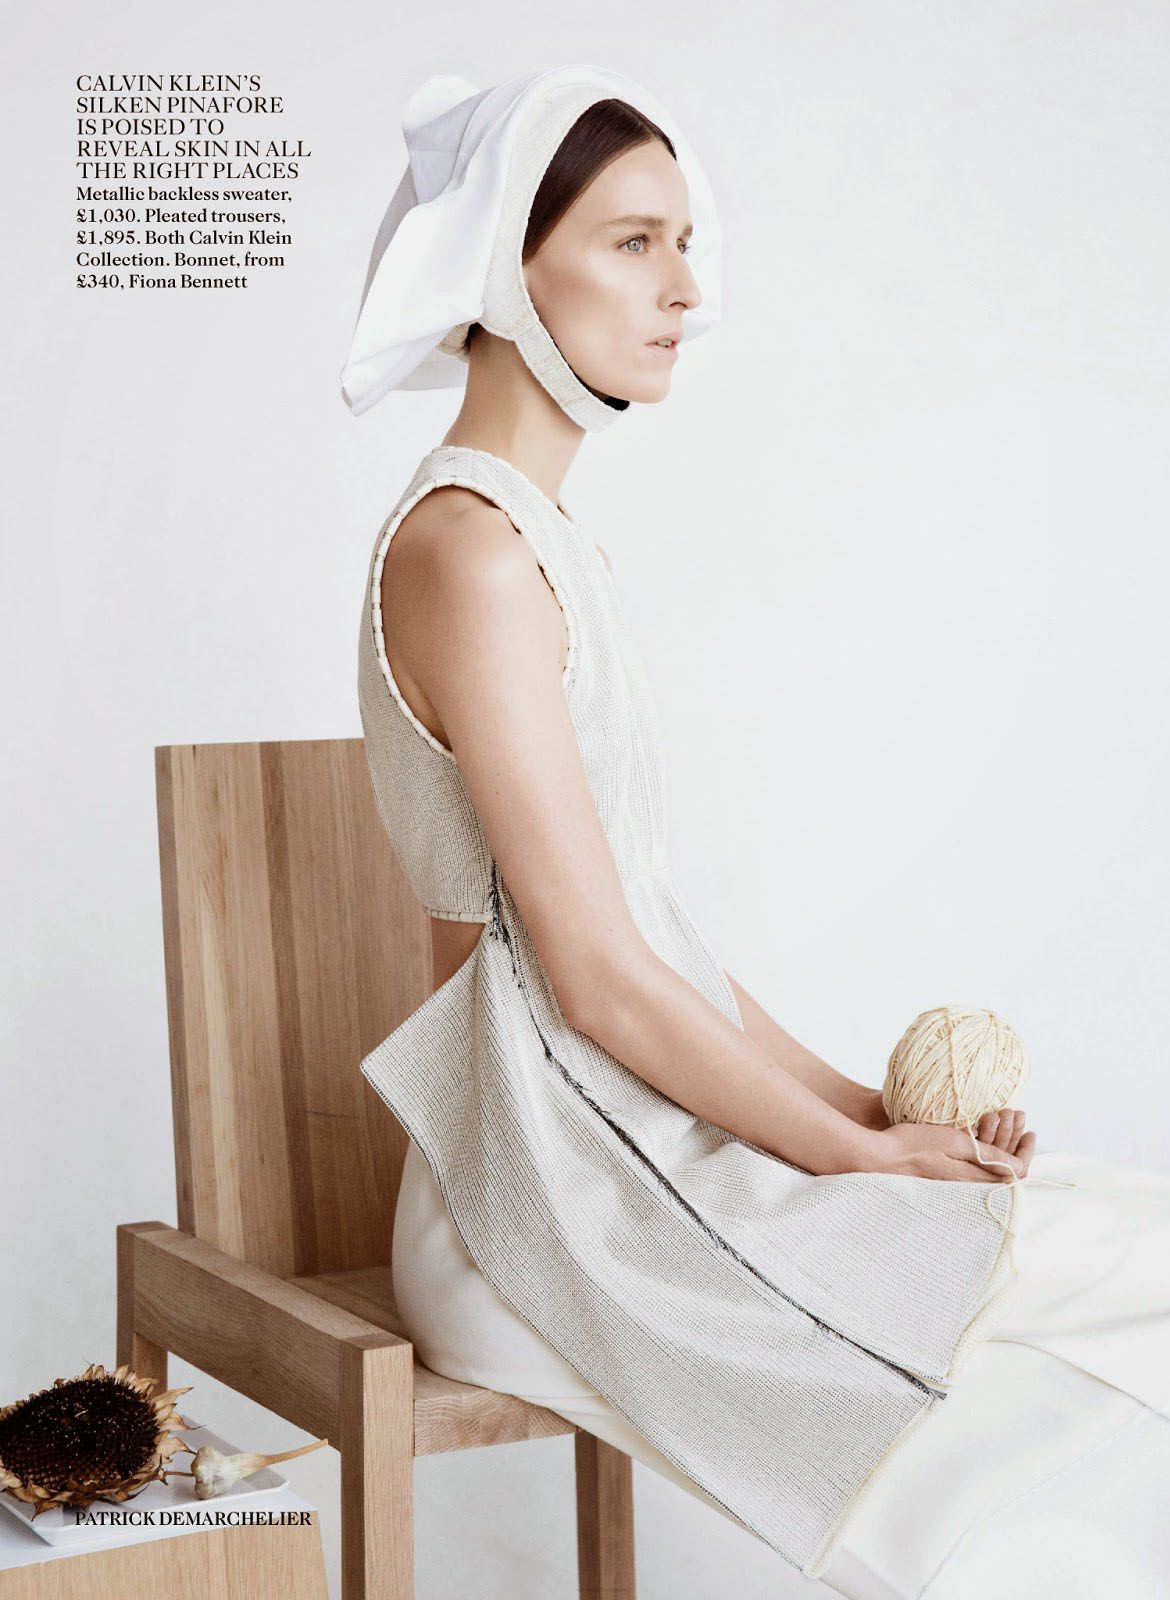 Clean Slate - Vogue UK Feb 2015 by Patrick Demarchelier - Calvin Klein